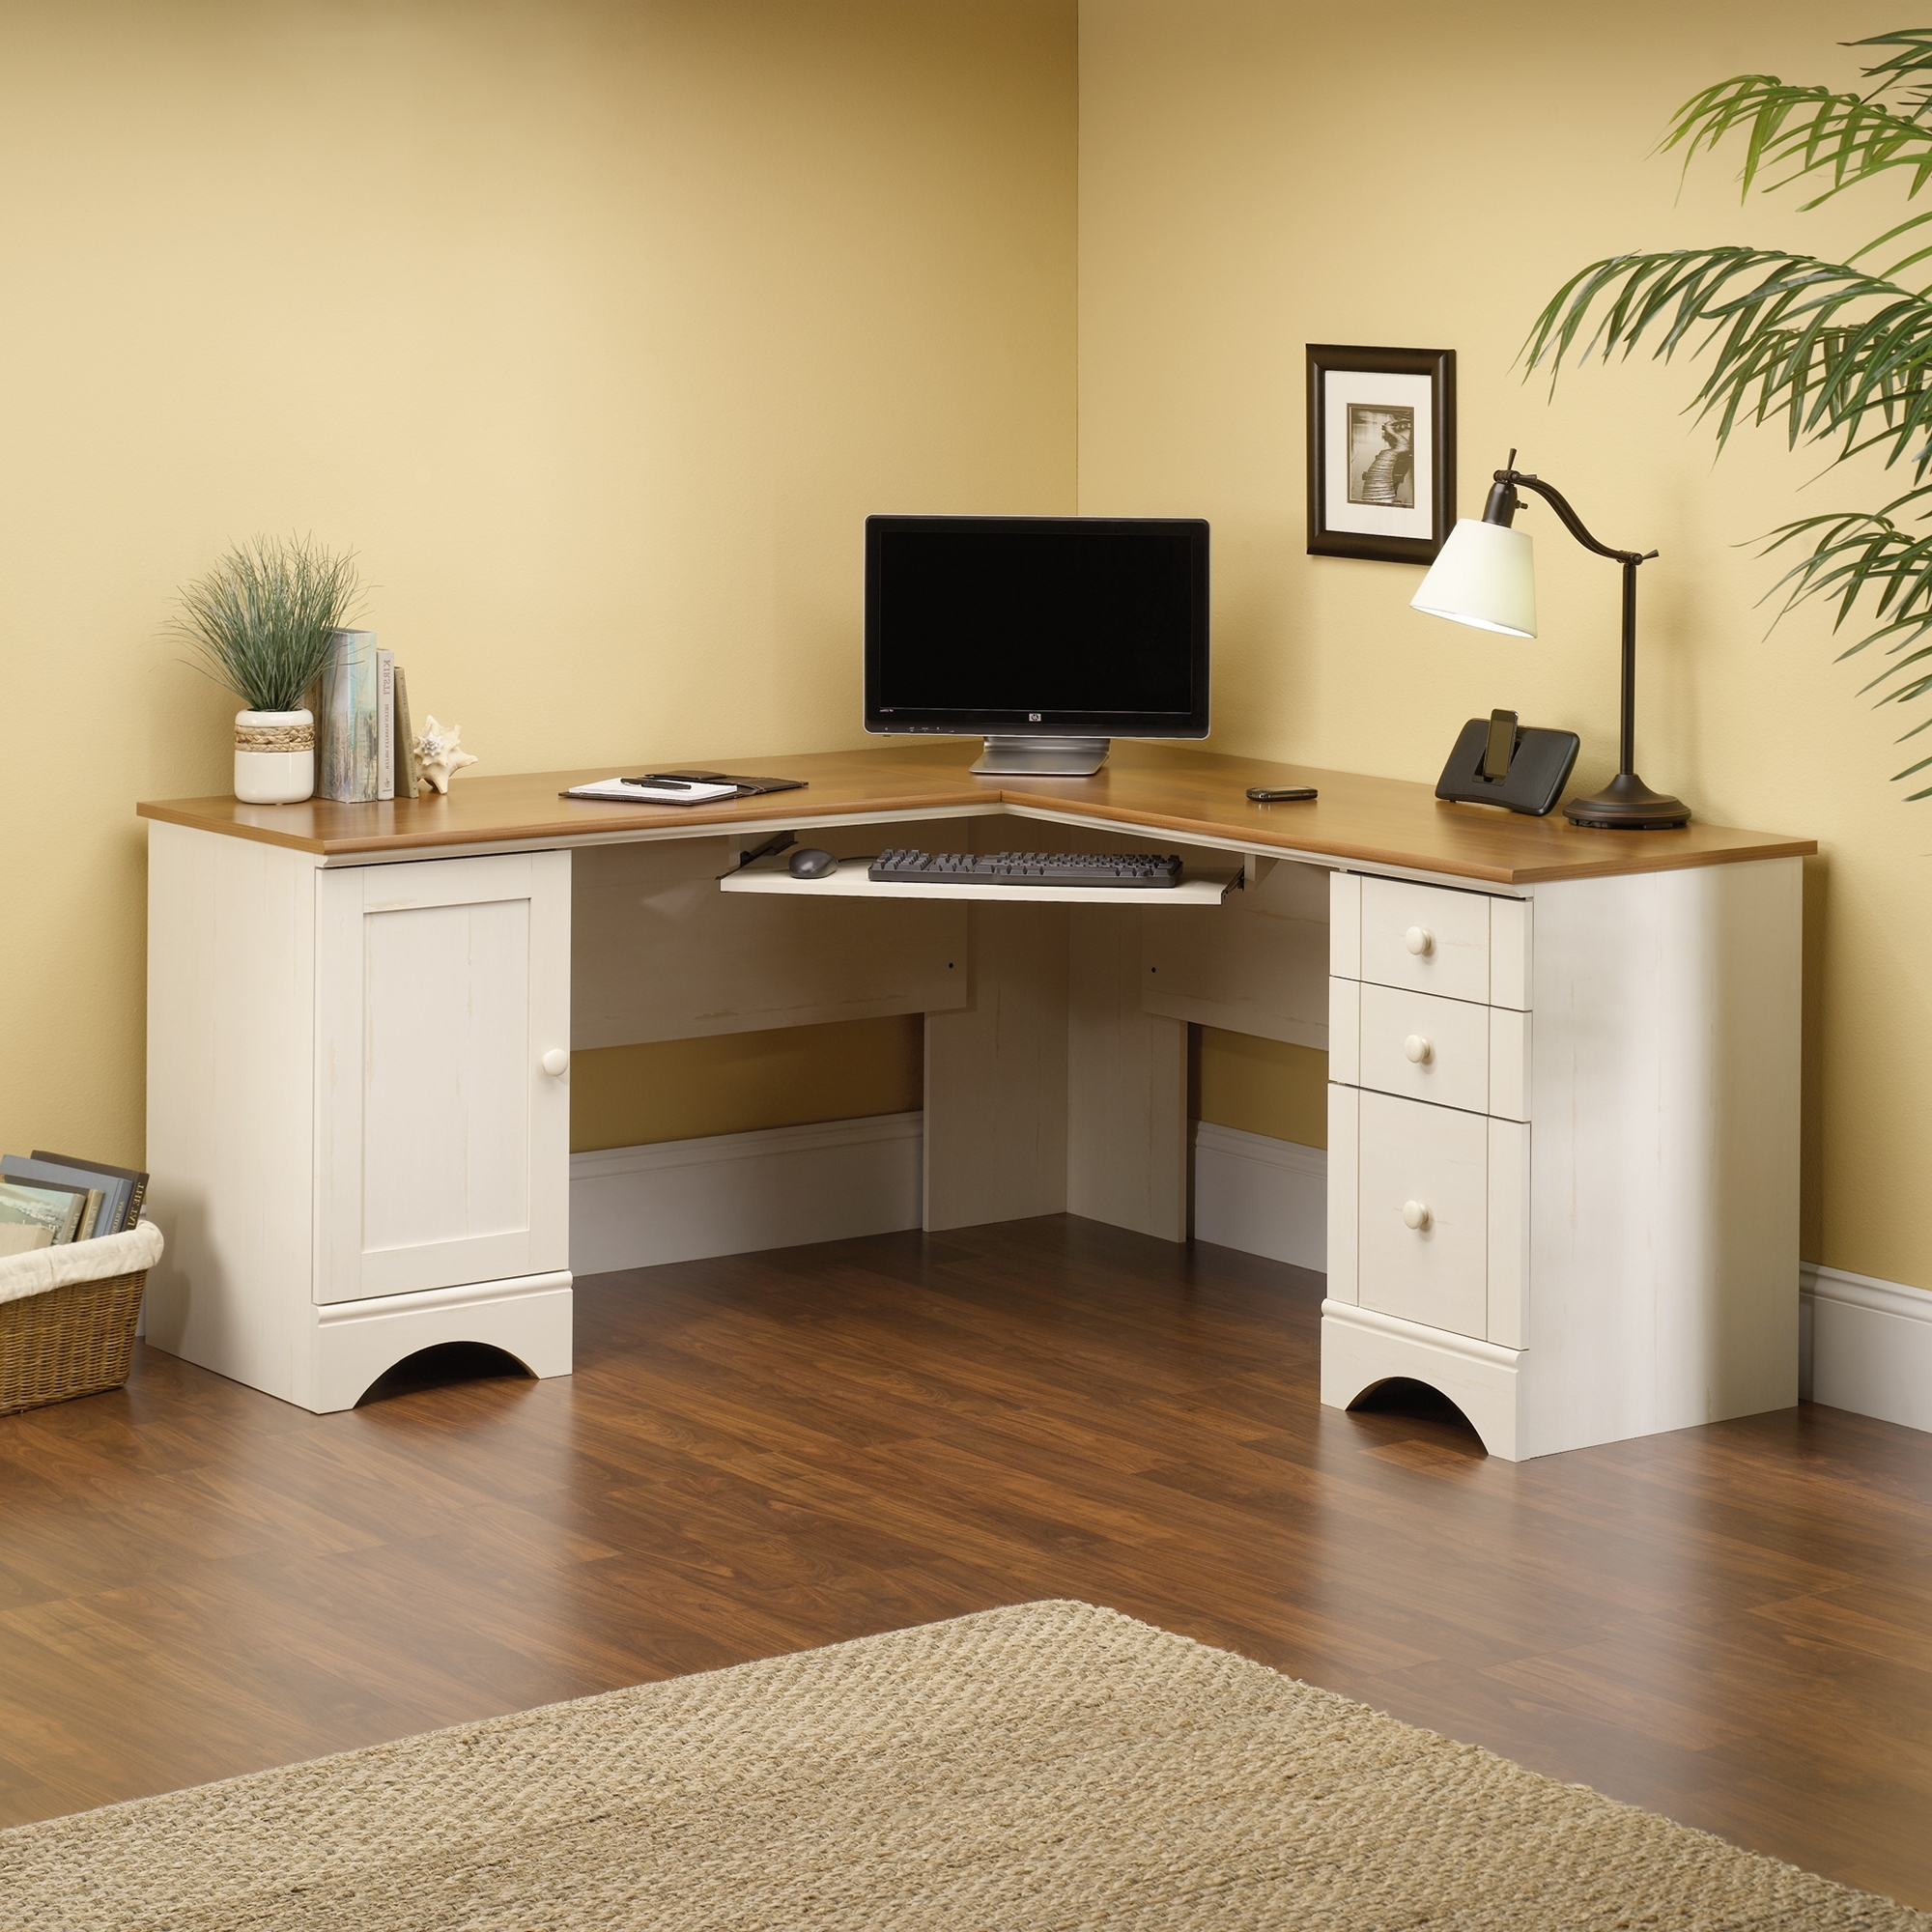 Antique Computer Desks With Recent Harbor View Corner Computer Desk (403793) – Sauder (View 13 of 20)